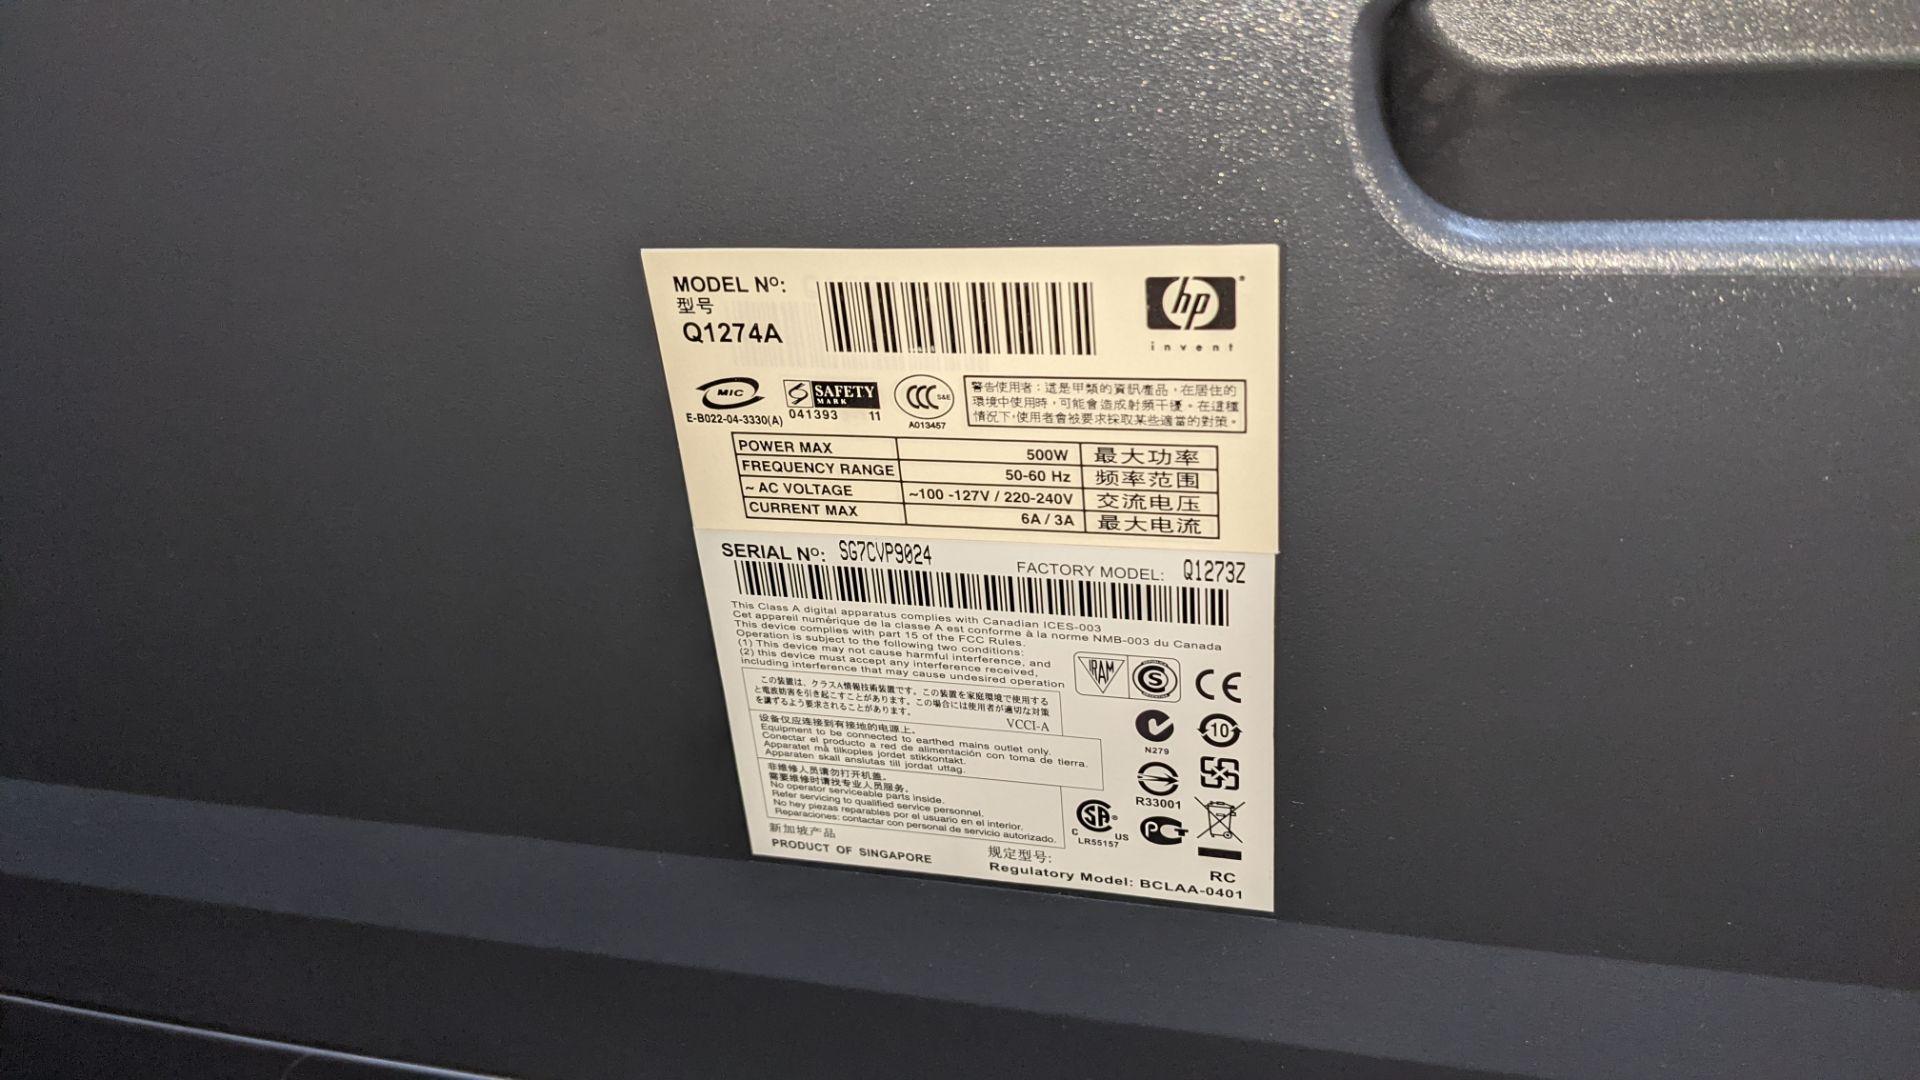 "HP DesignJet 4000ps wide format printer, model Q1274A (42"") - Image 5 of 7"